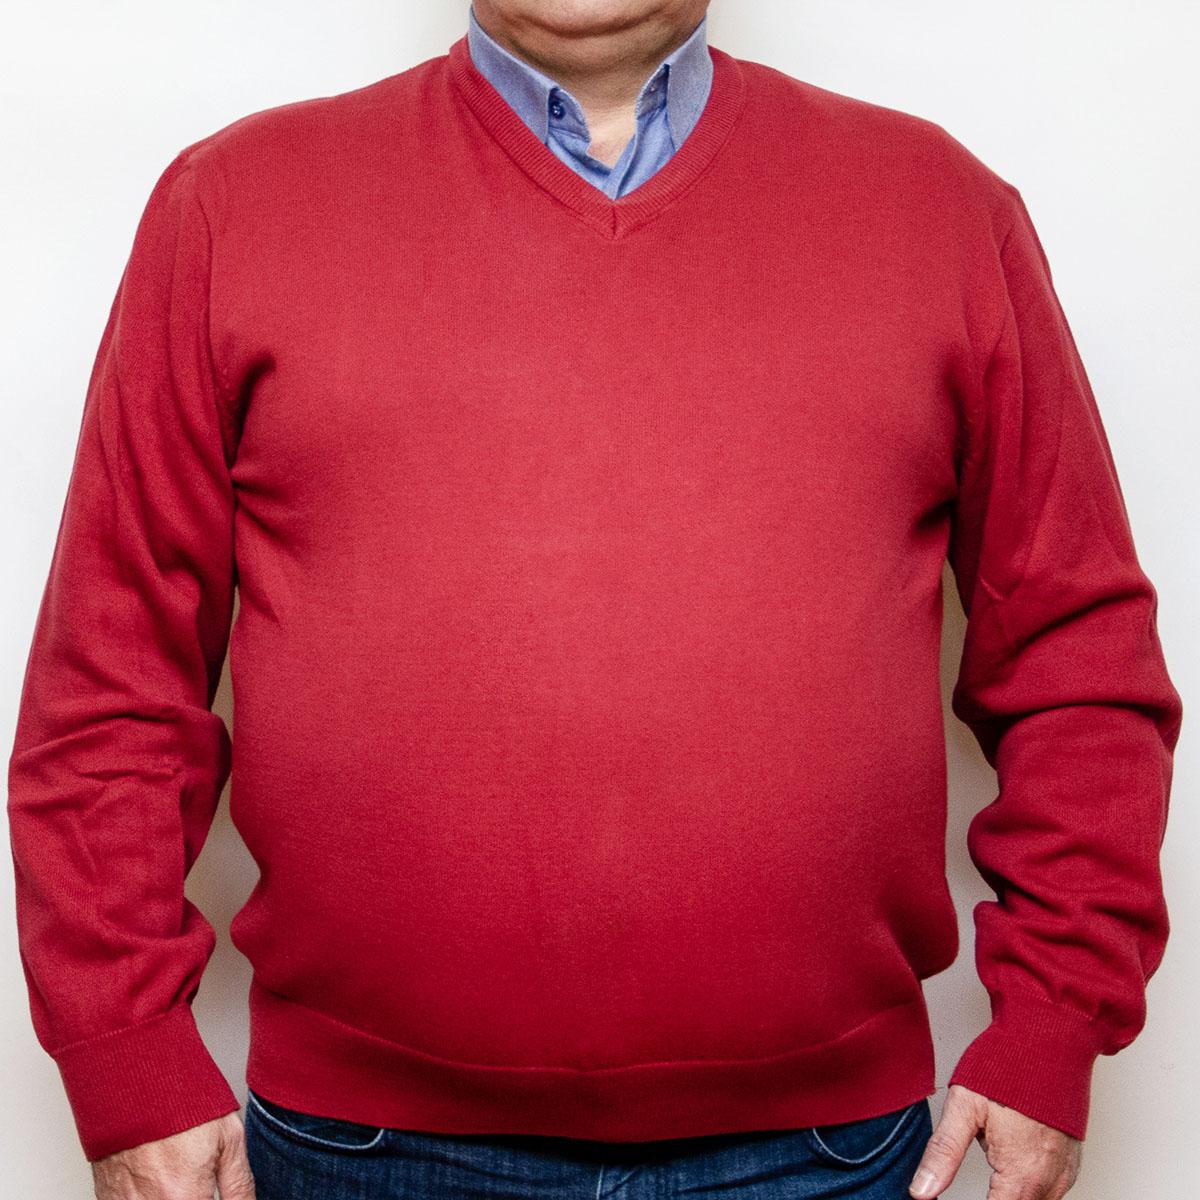 Pulover rosu caramiziu cu anchior, Marime 3XL - egato.ro